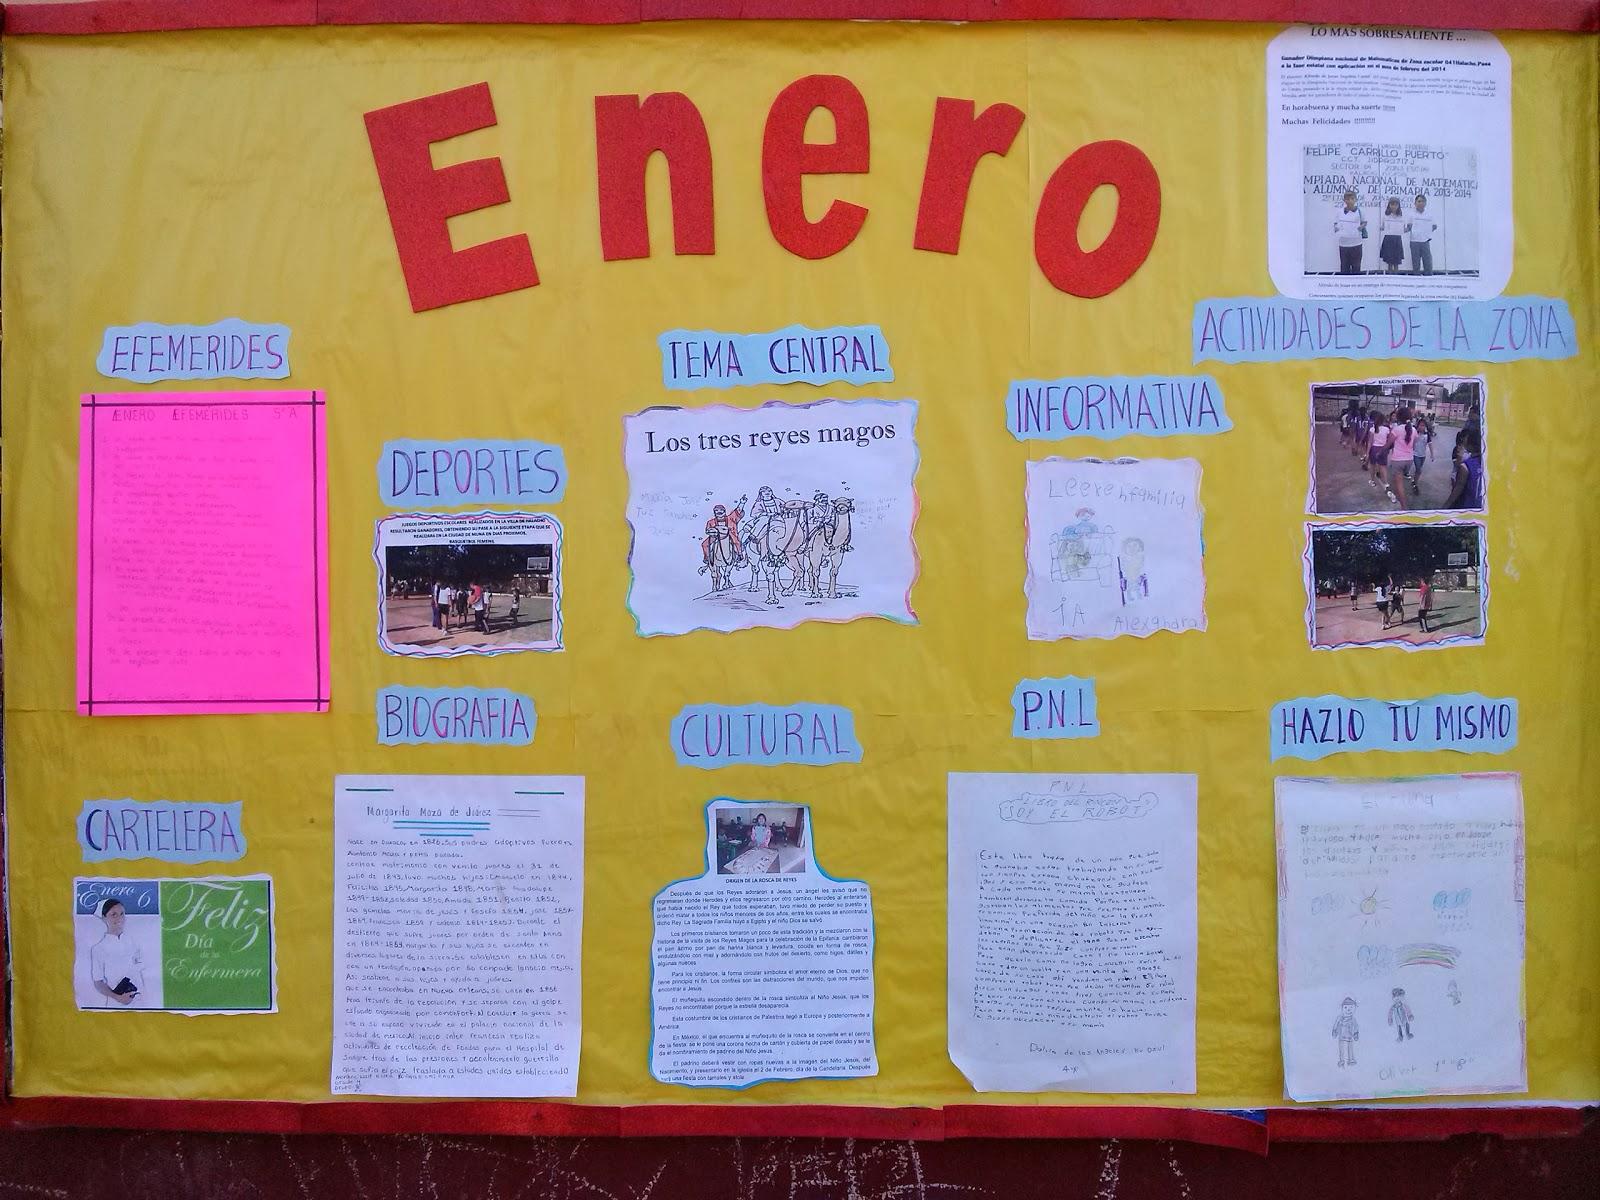 Periodico mura enero 1 imagenes educativas for Estructura de un periodico mural